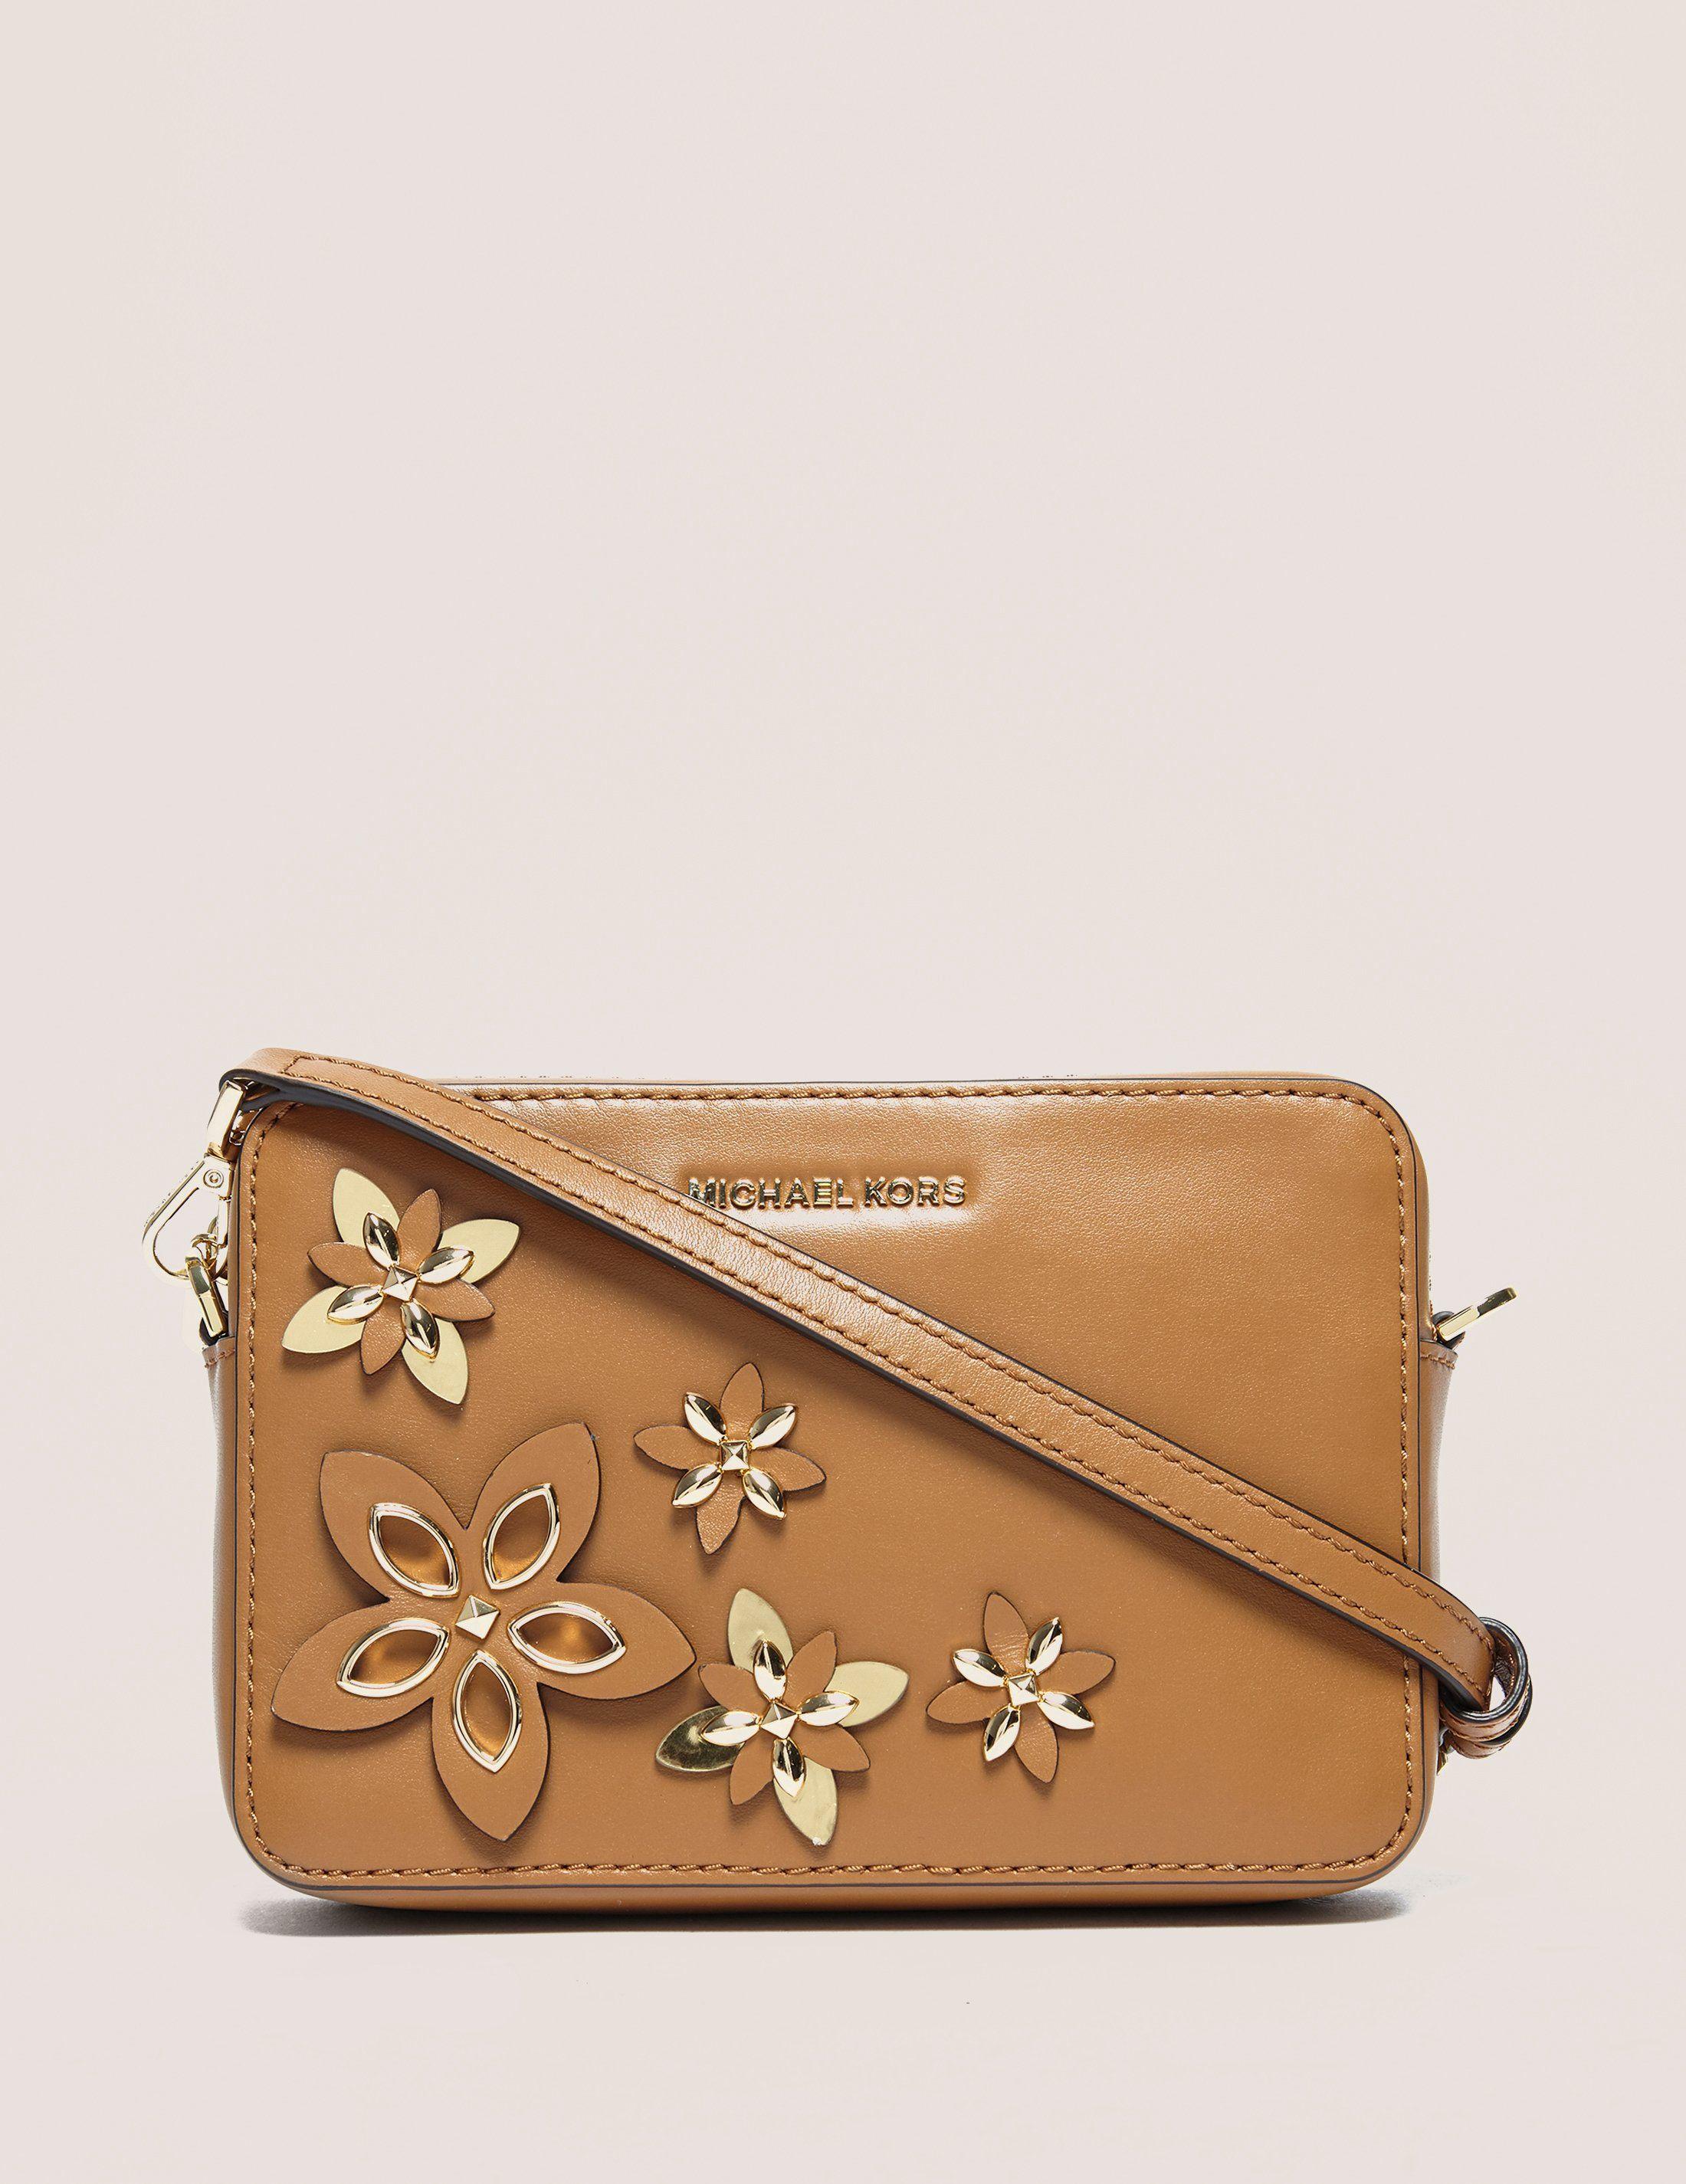 Michael Kors Flowers Medium Camera Bag